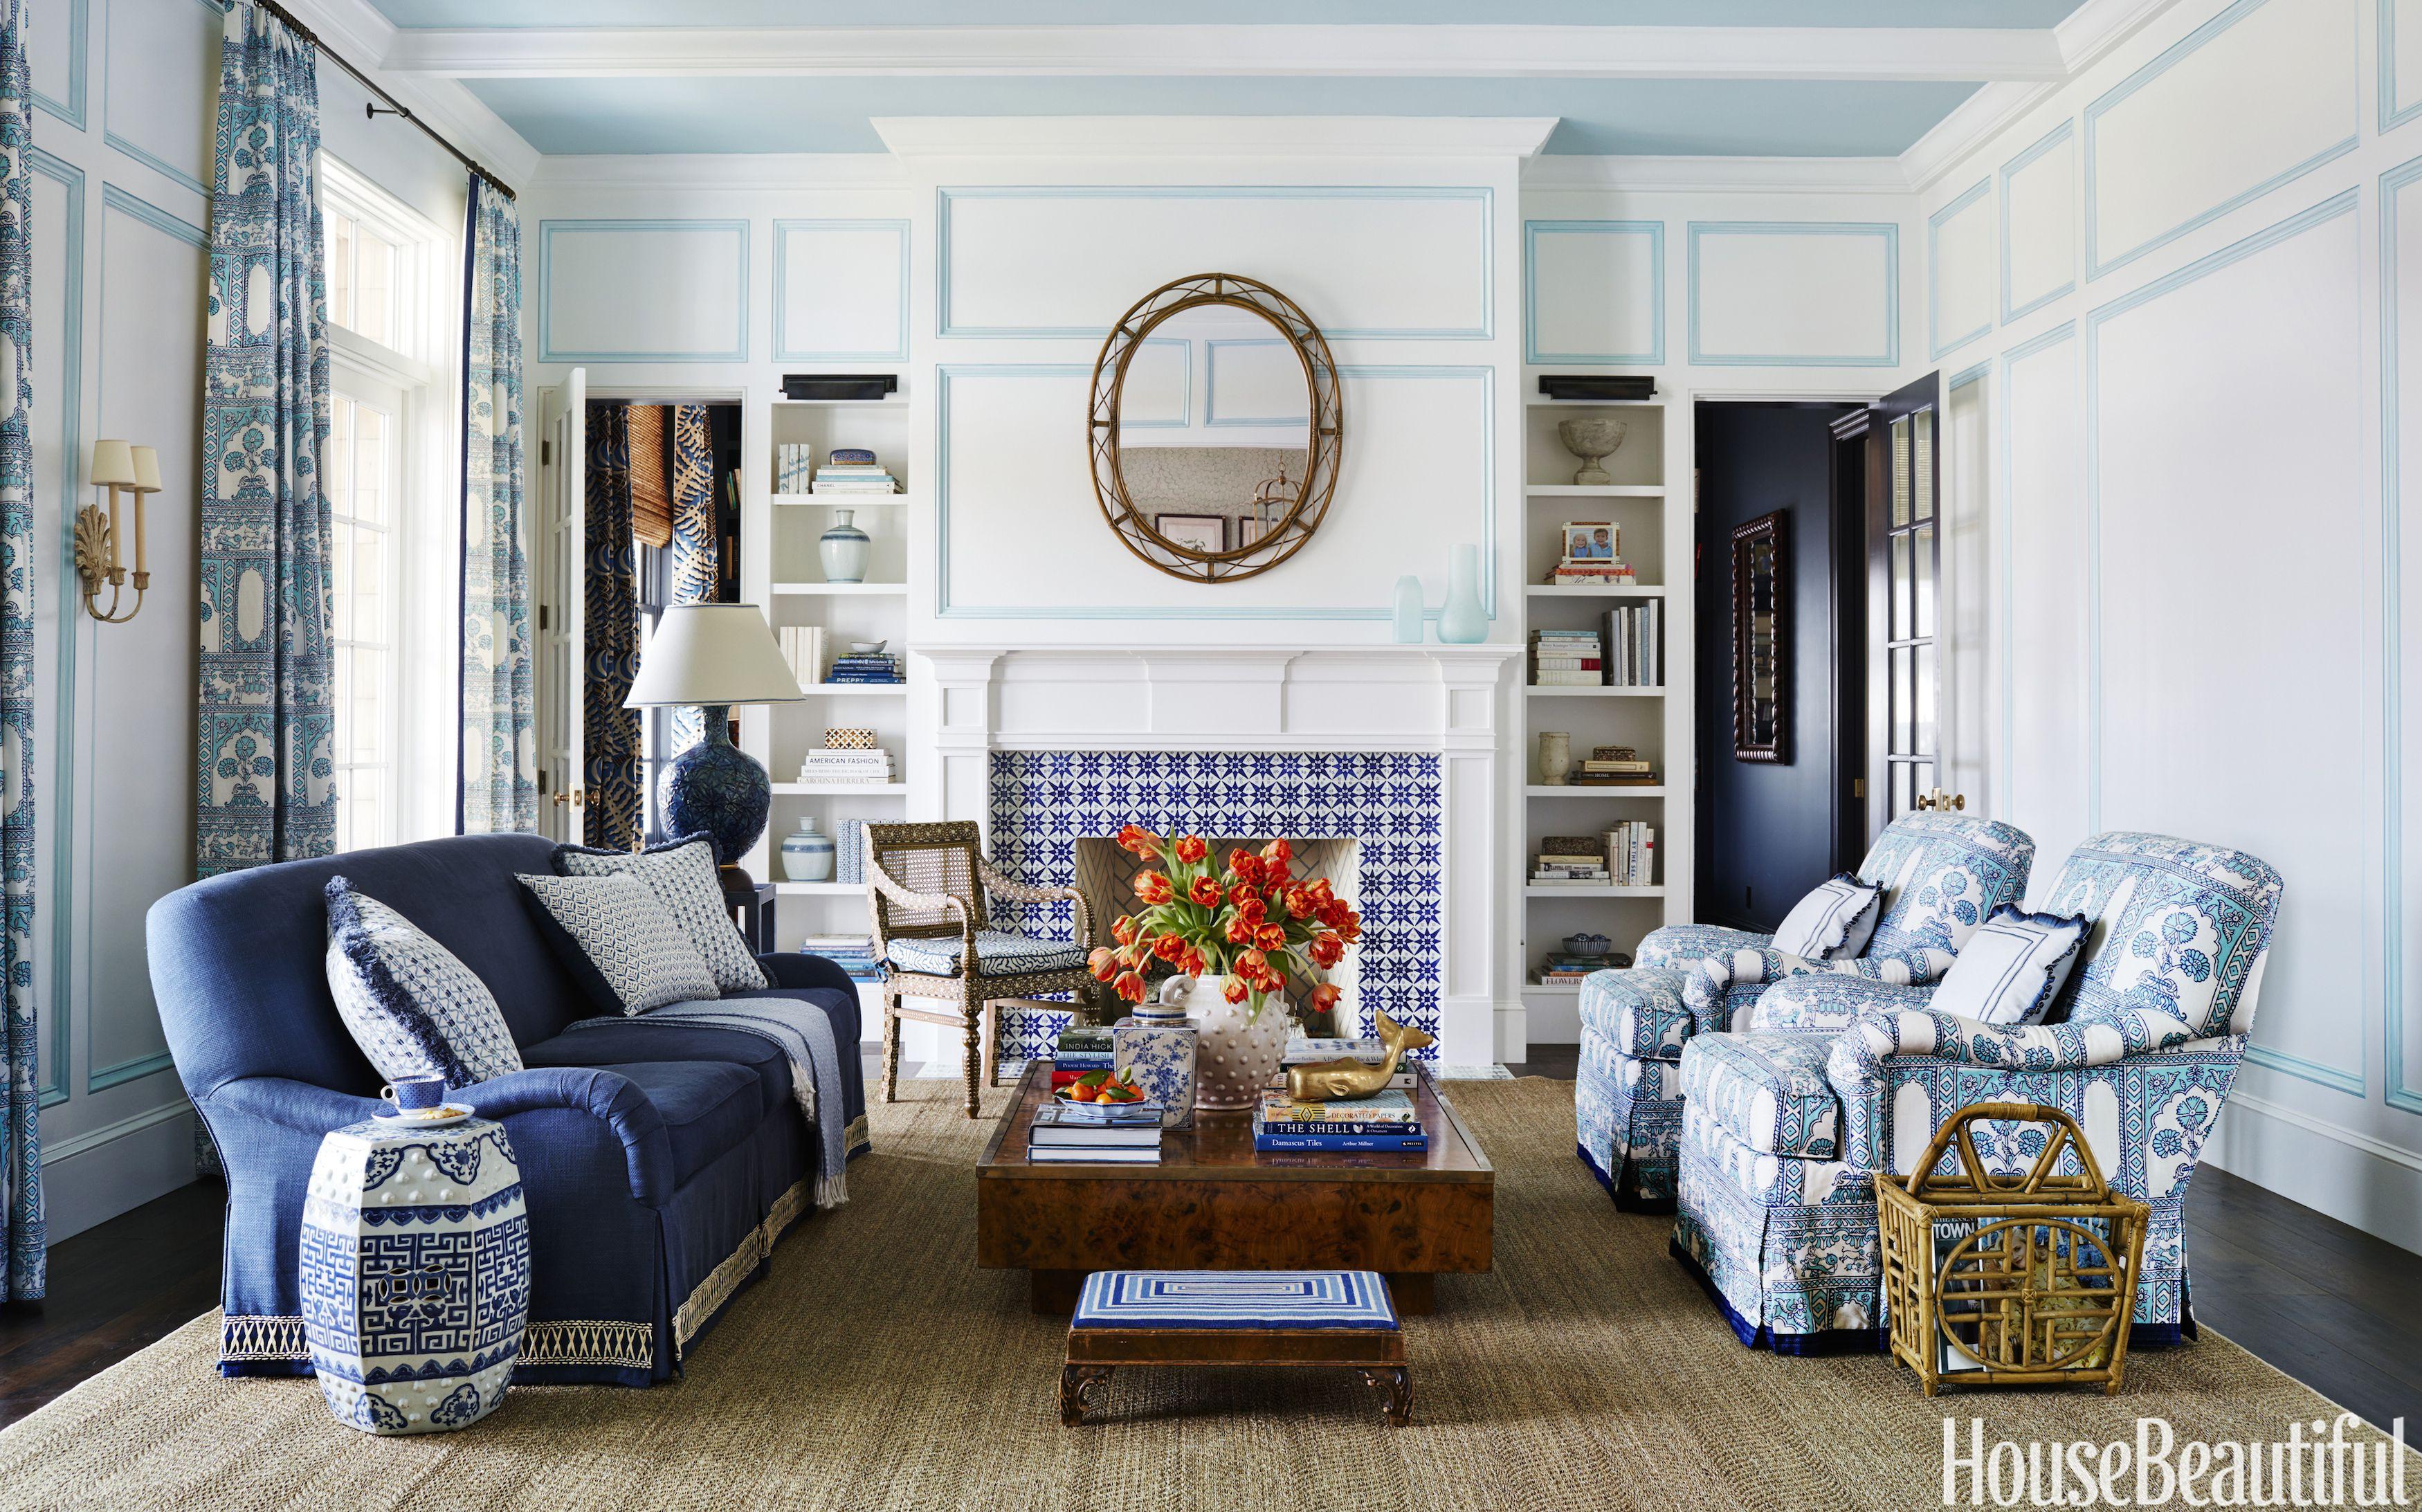 Living Room Designs 70 Best Living Room Decorating Ideas & Designs - housebeautiful.com FQKGWXC